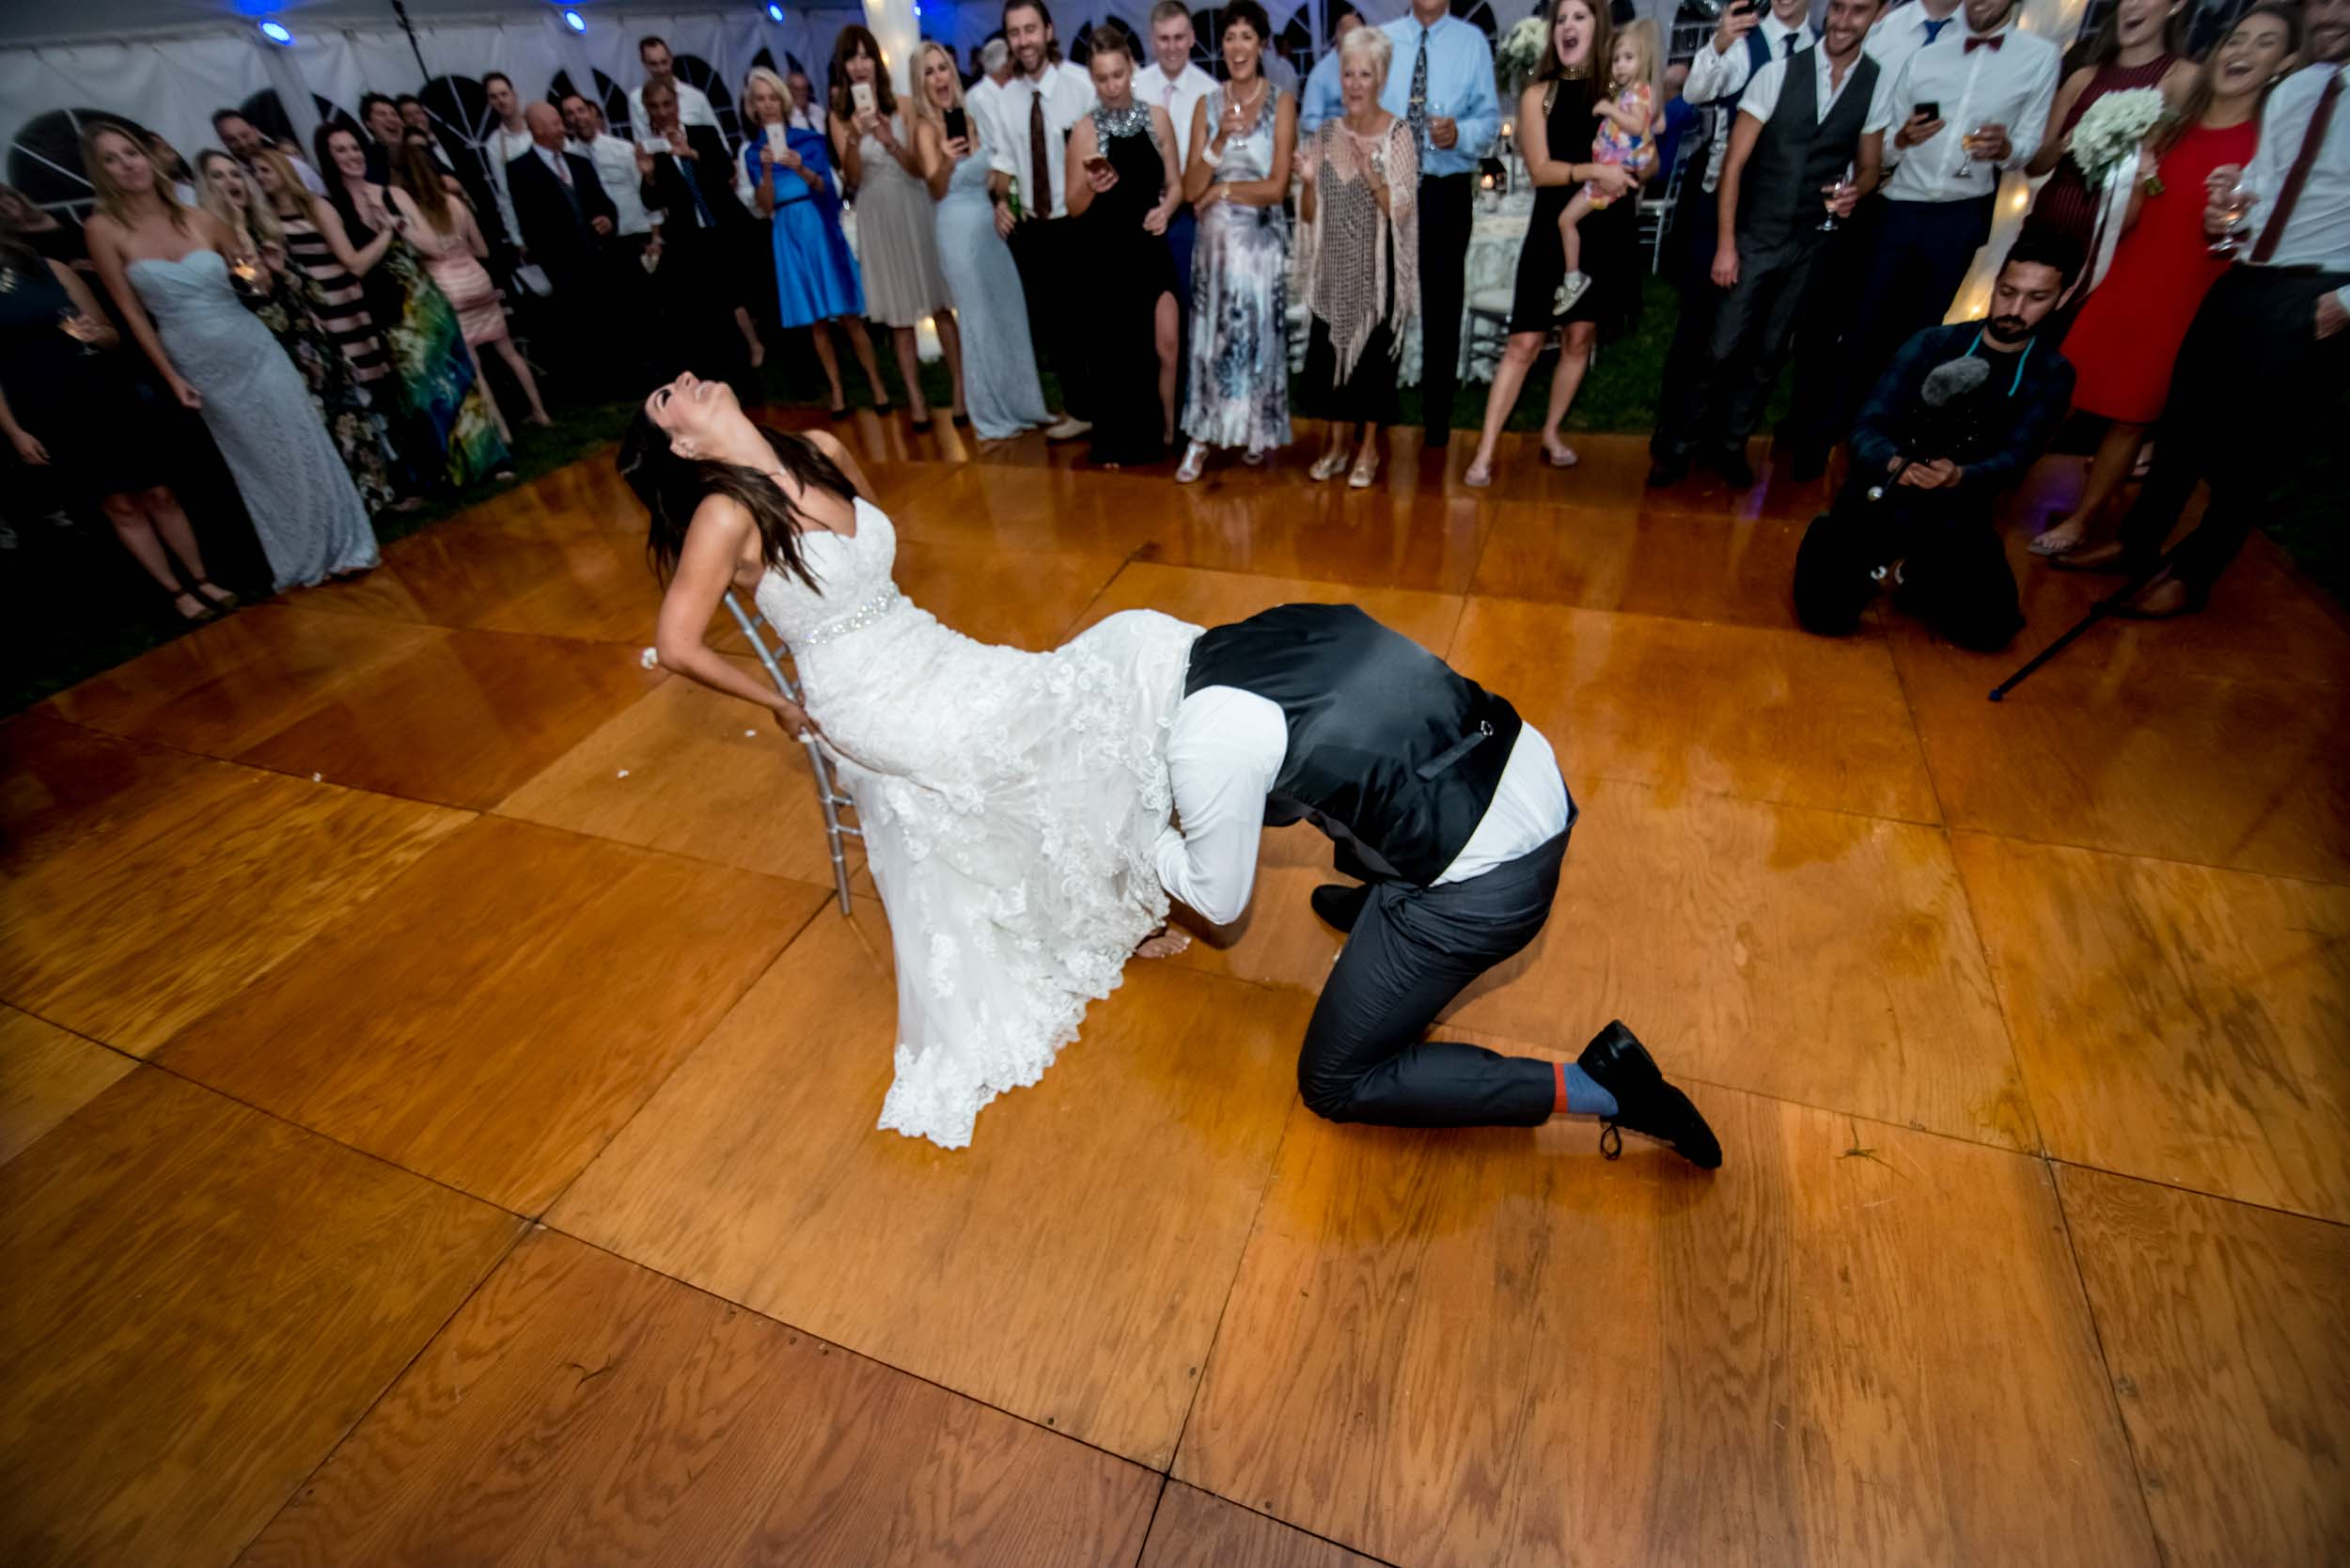 dc+metro+wedding+photographer+vadym+guliuk+photography+wedding+garter+toss-2022.jpg